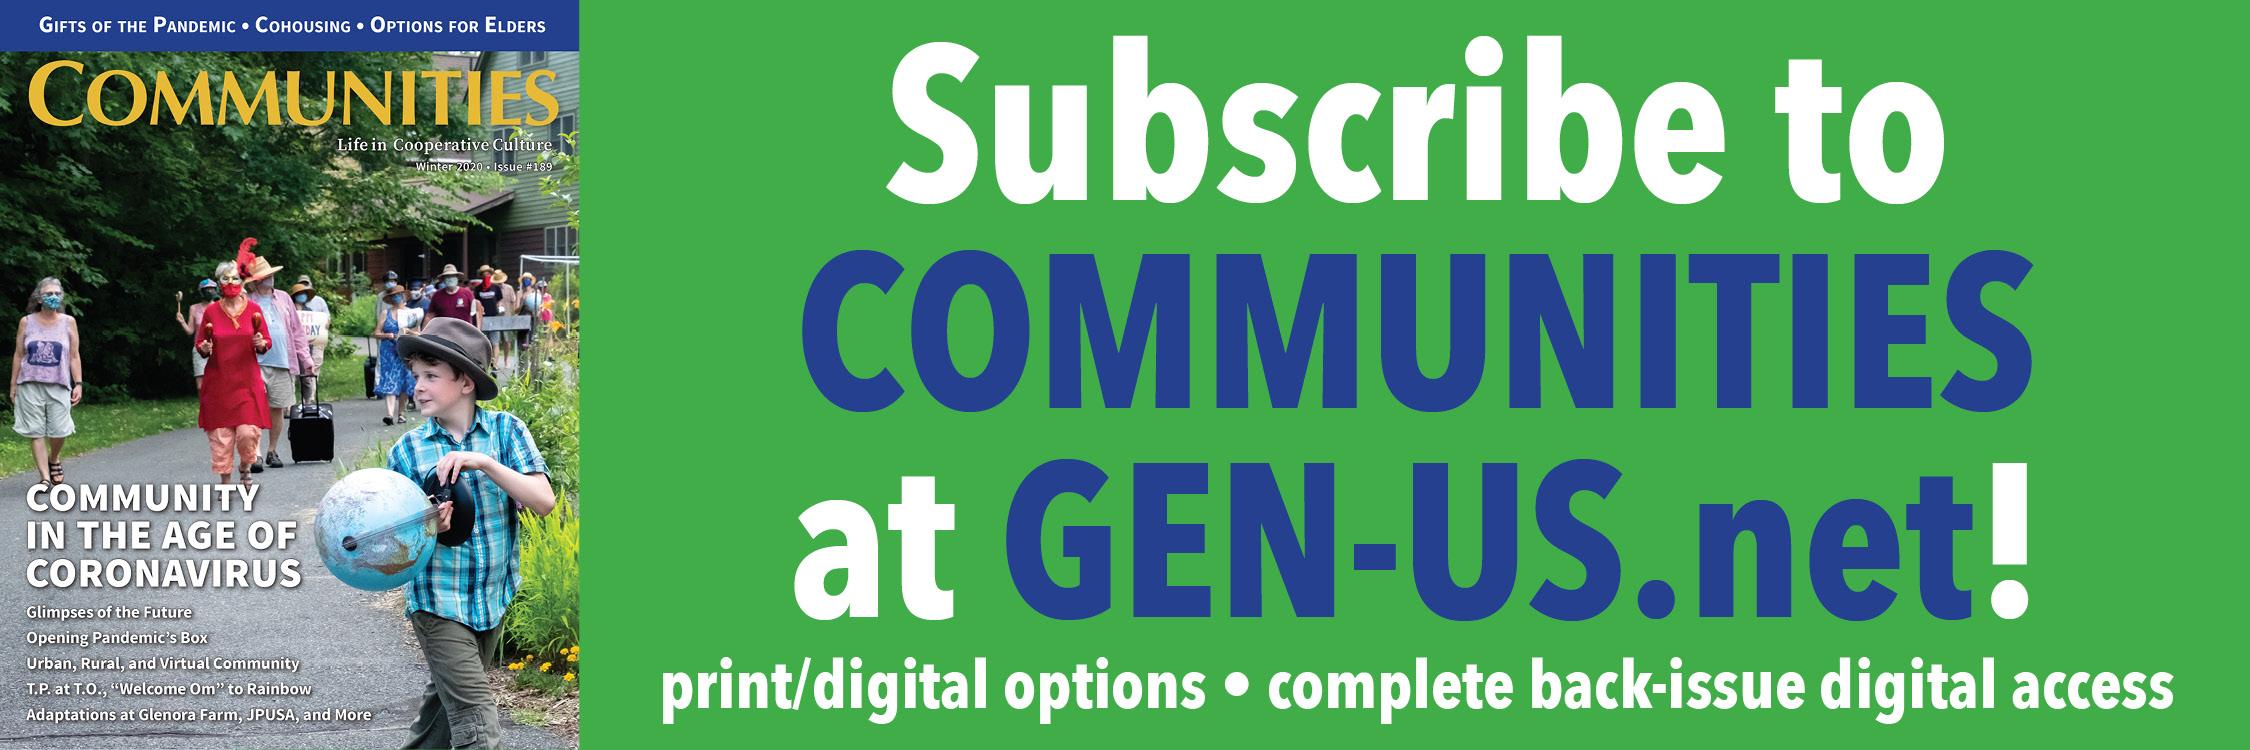 Communities Banner Ad